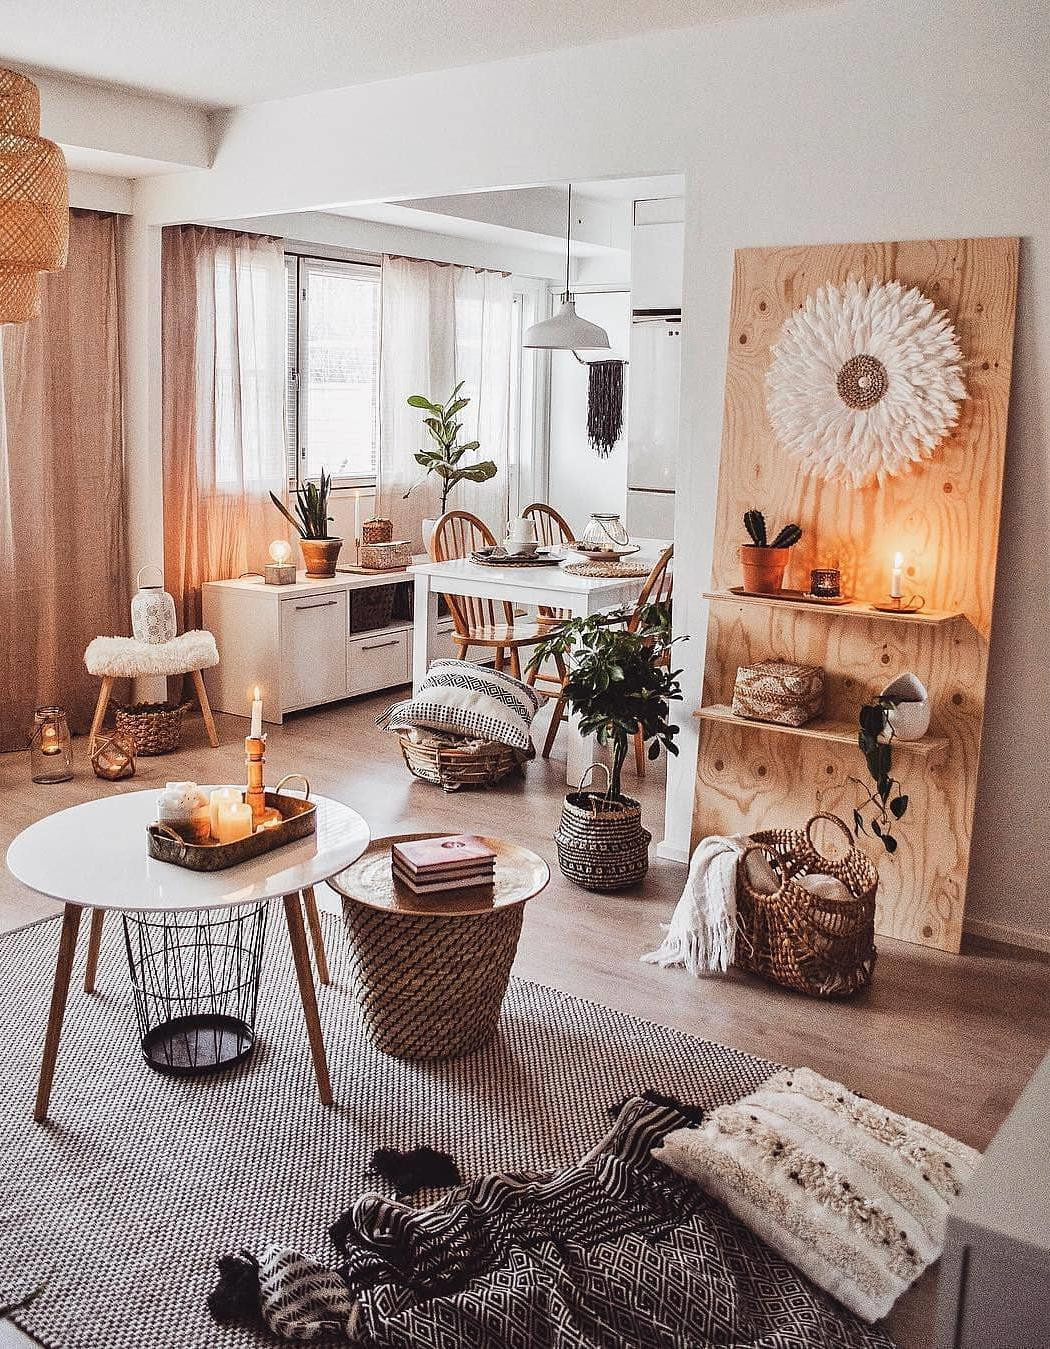 50+ Inspiring Living Room Decorating Ideas